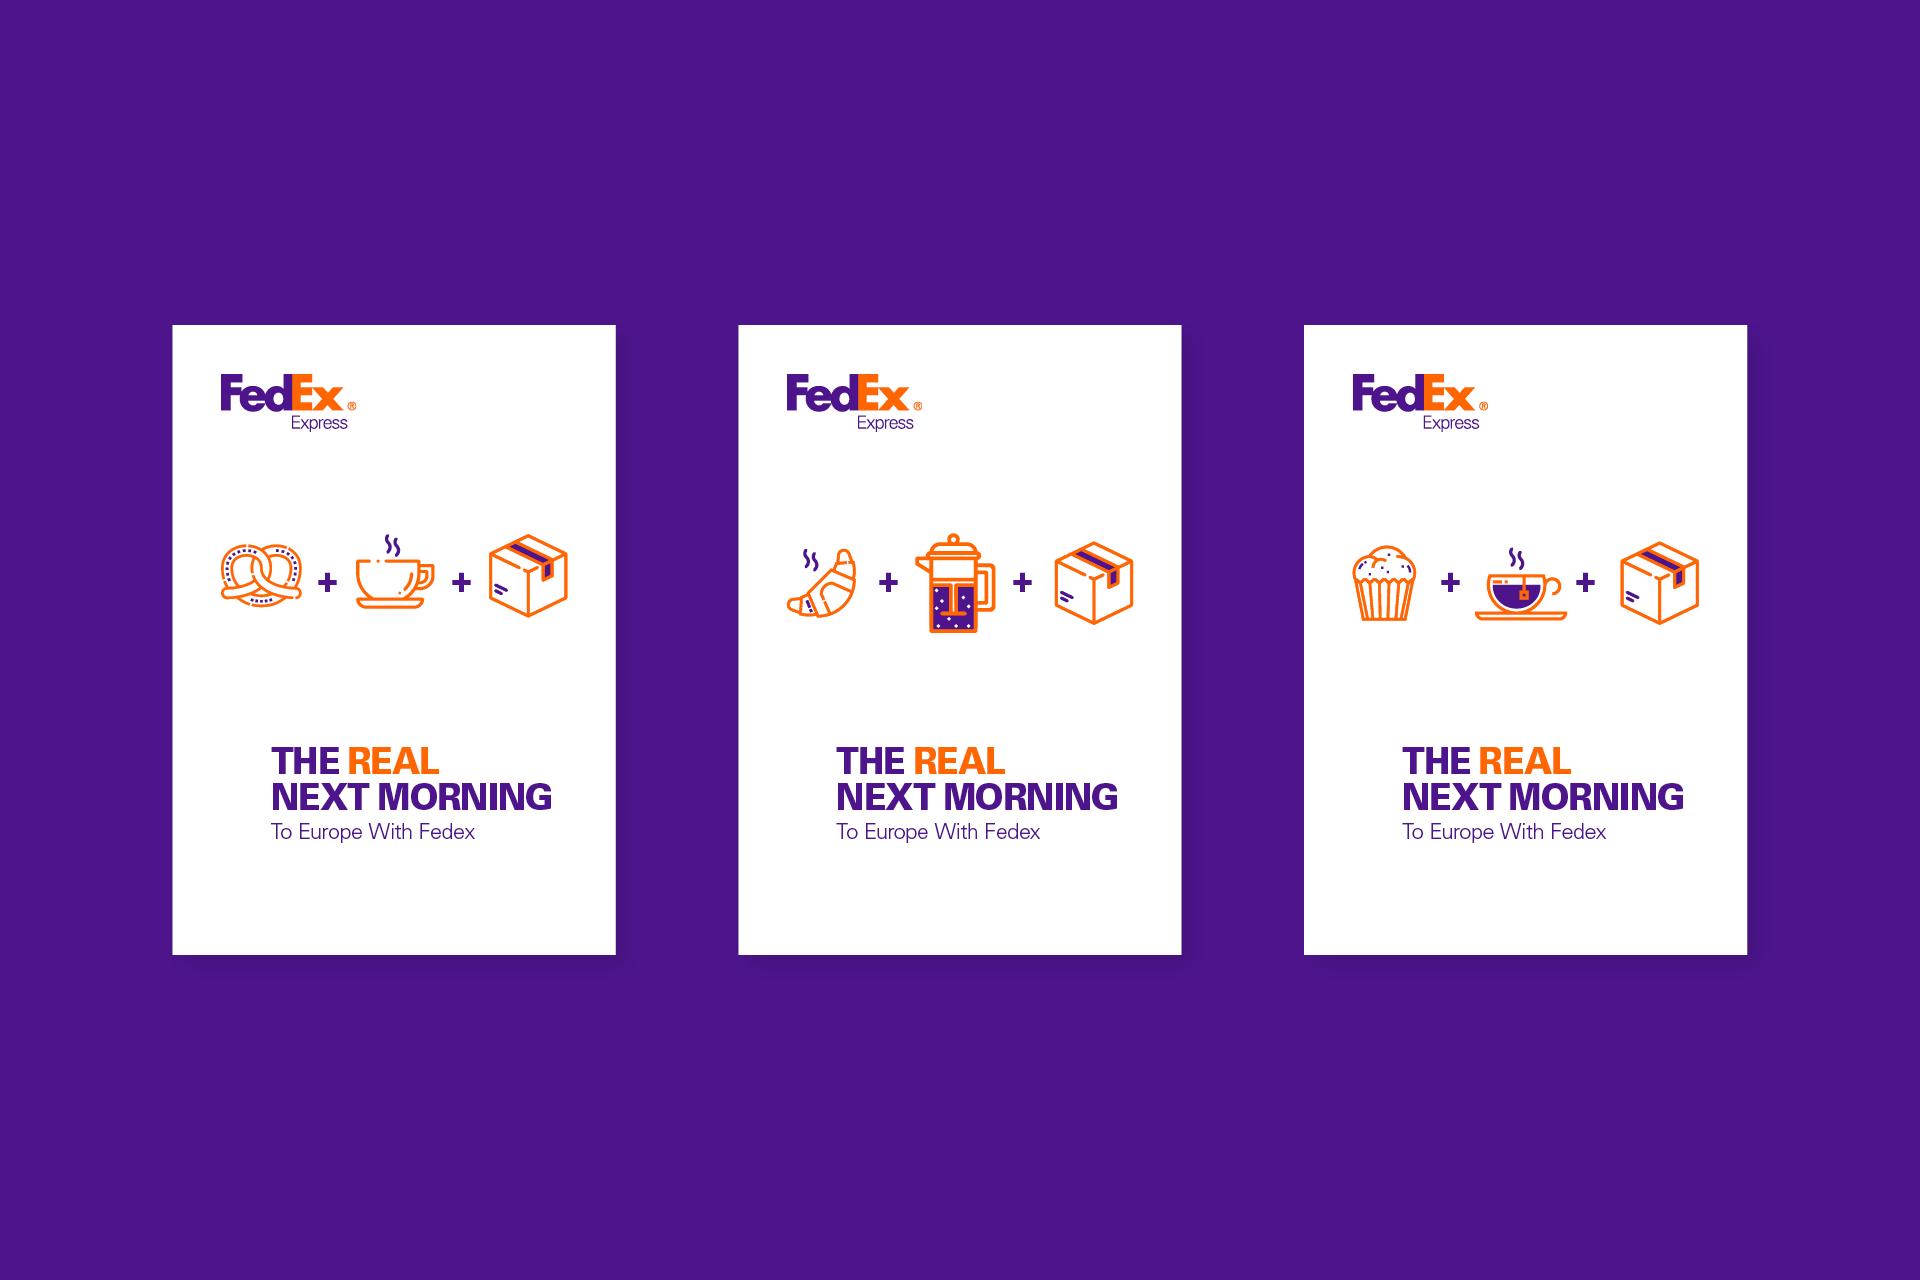 FedEx posters 3